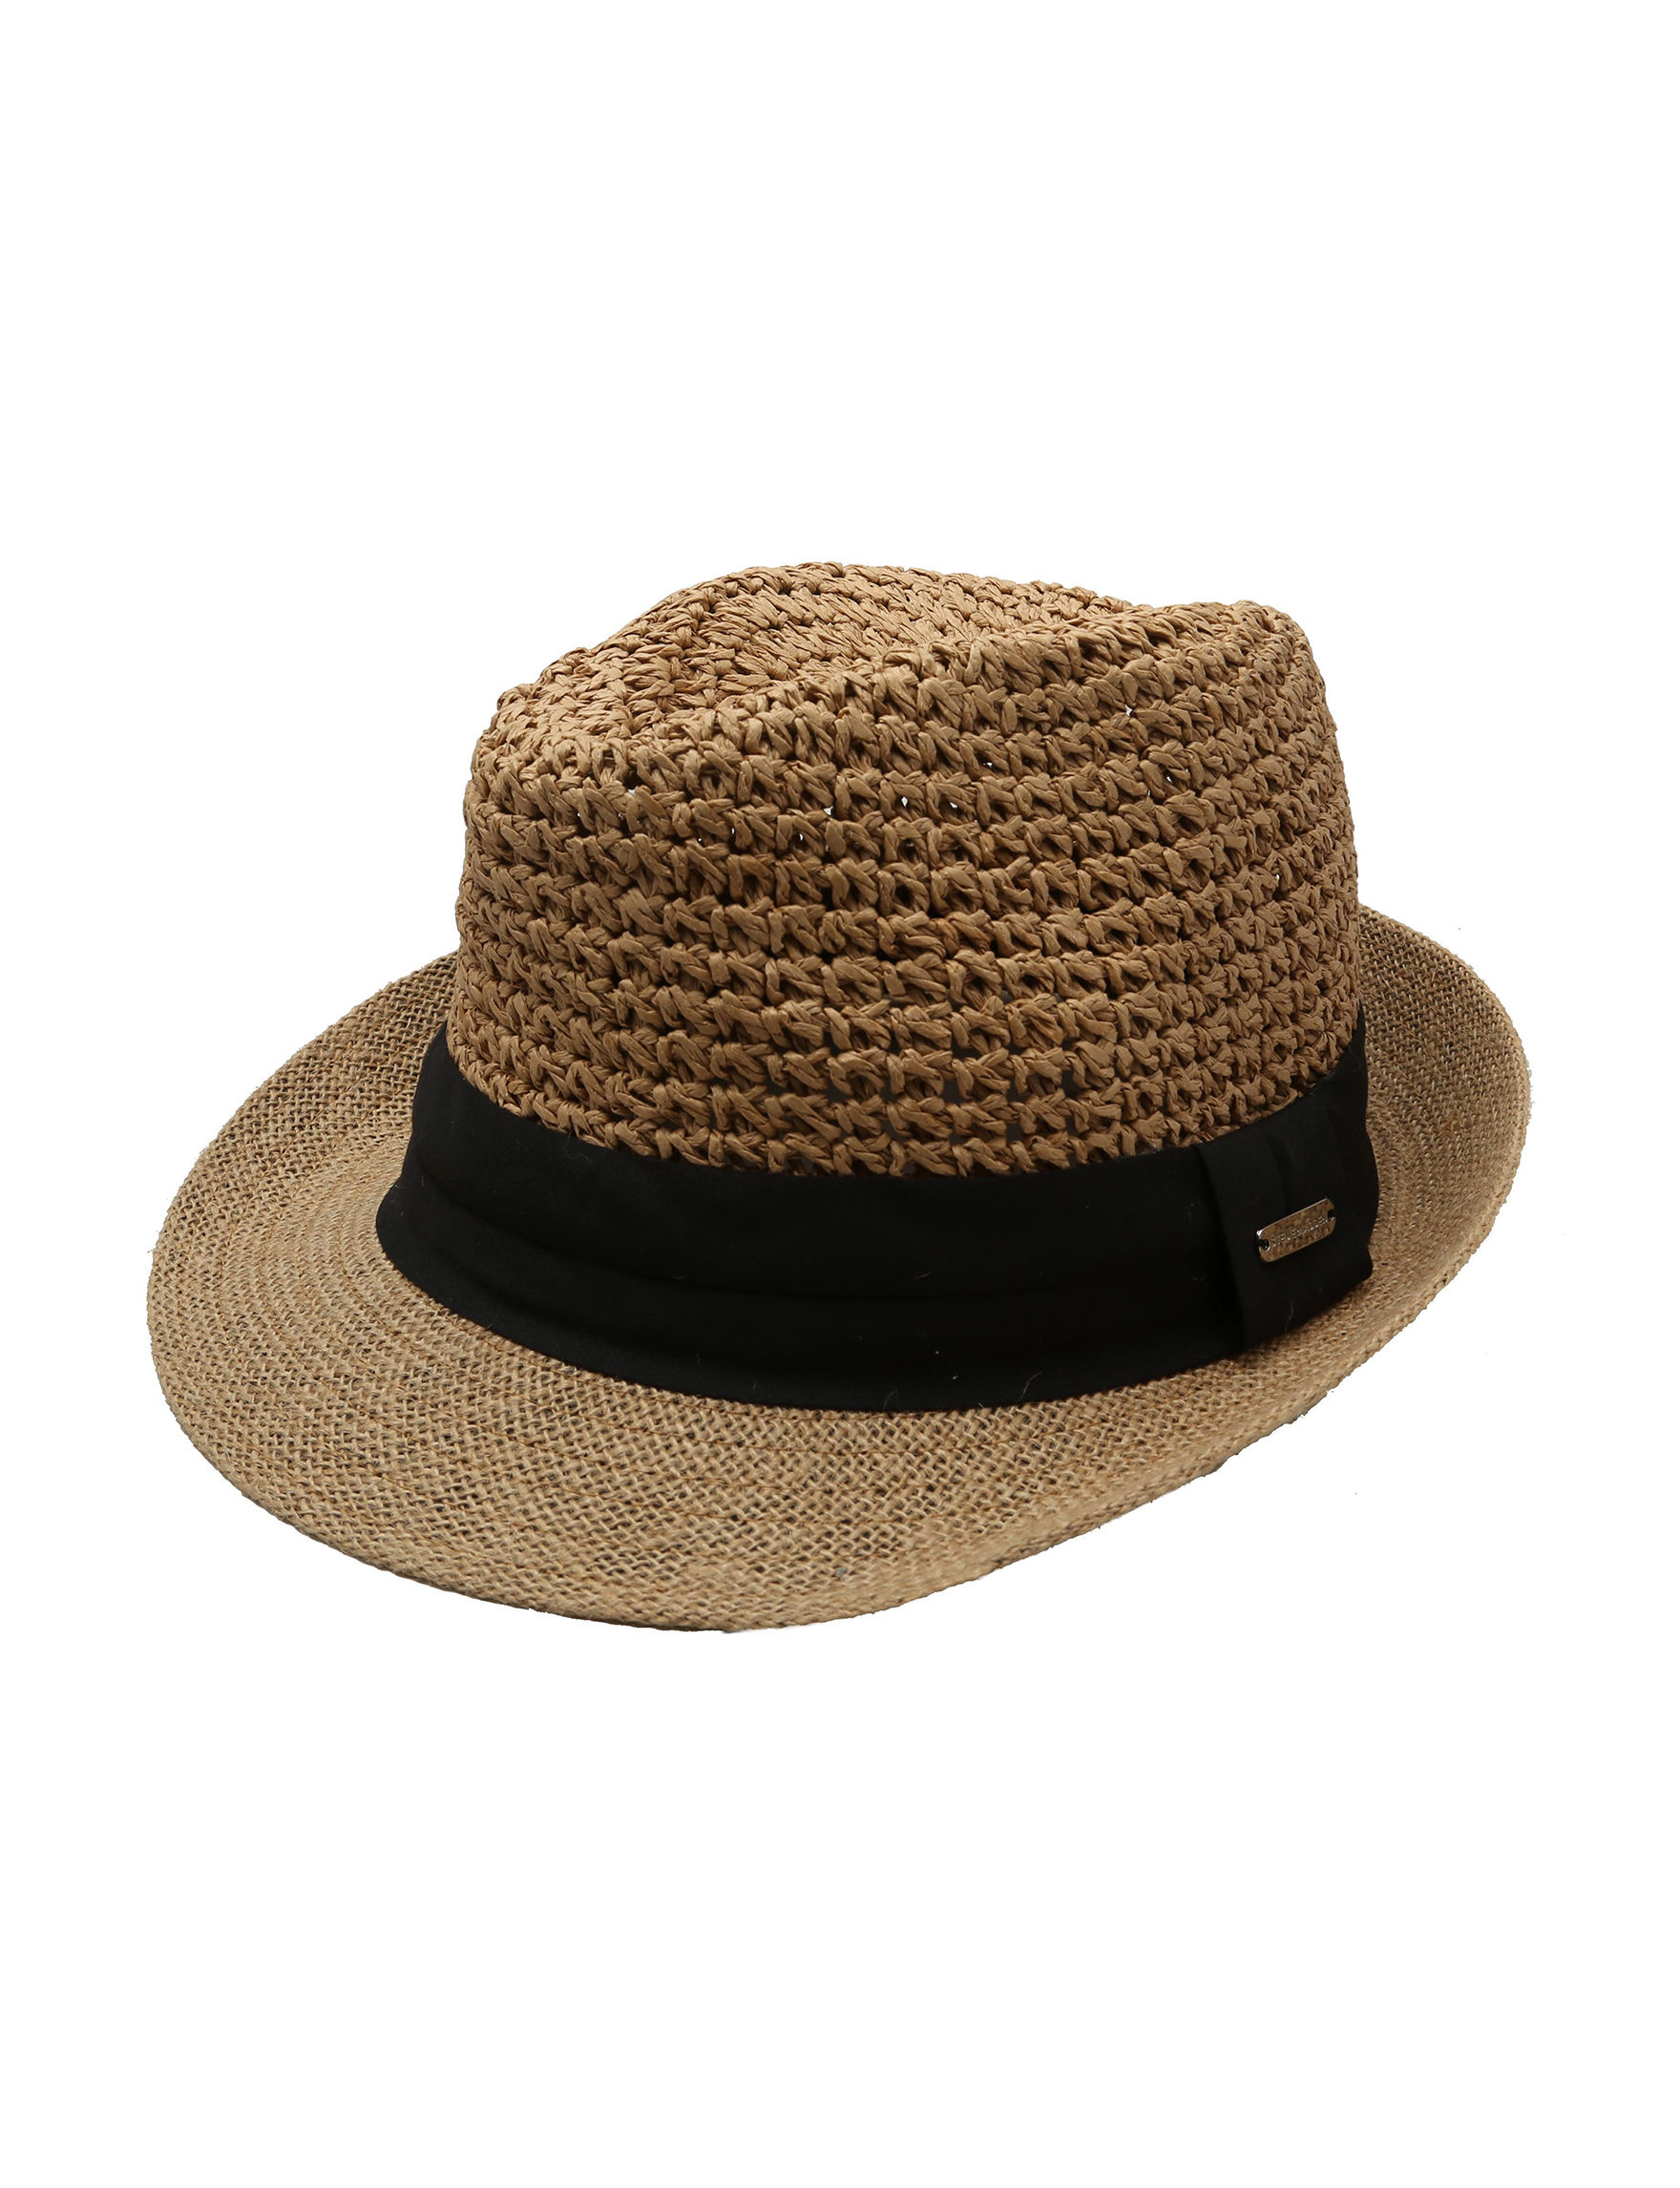 Cejon Tan / Black Hats & Headwear